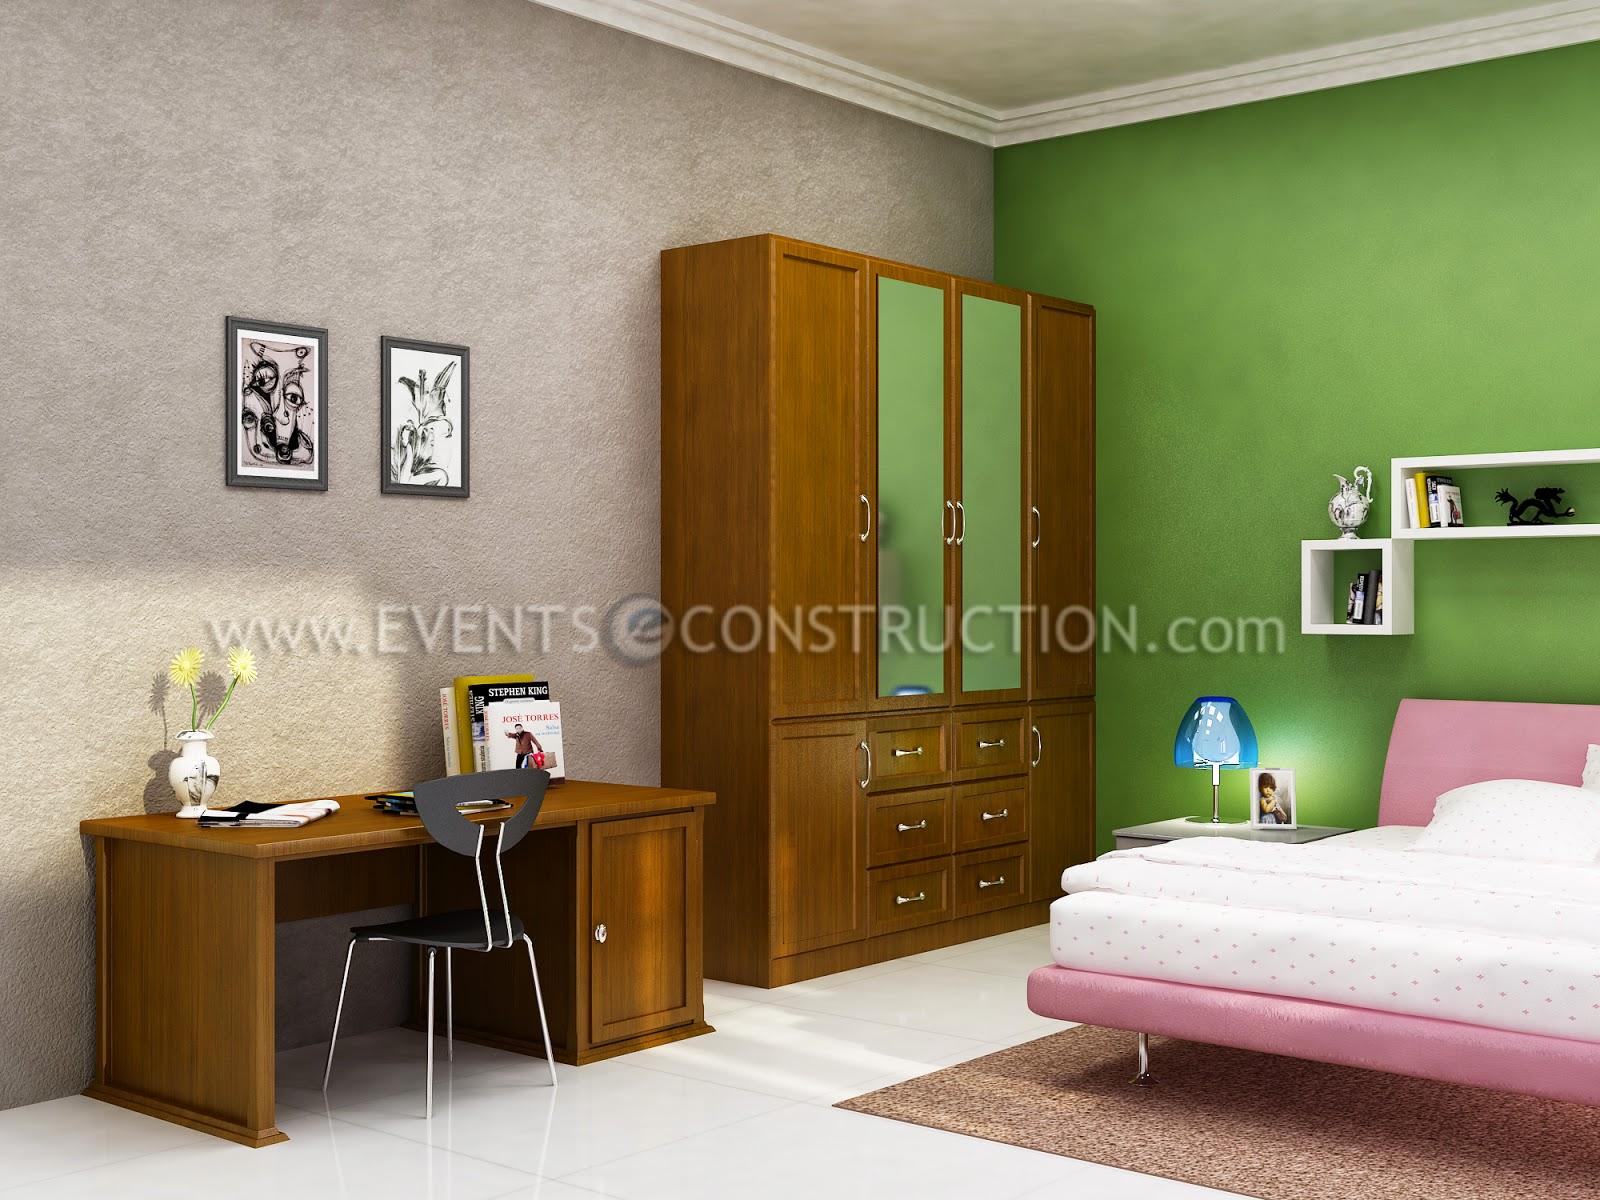 Evens Construction Pvt Ltd Kerala Bedroom Interior Design